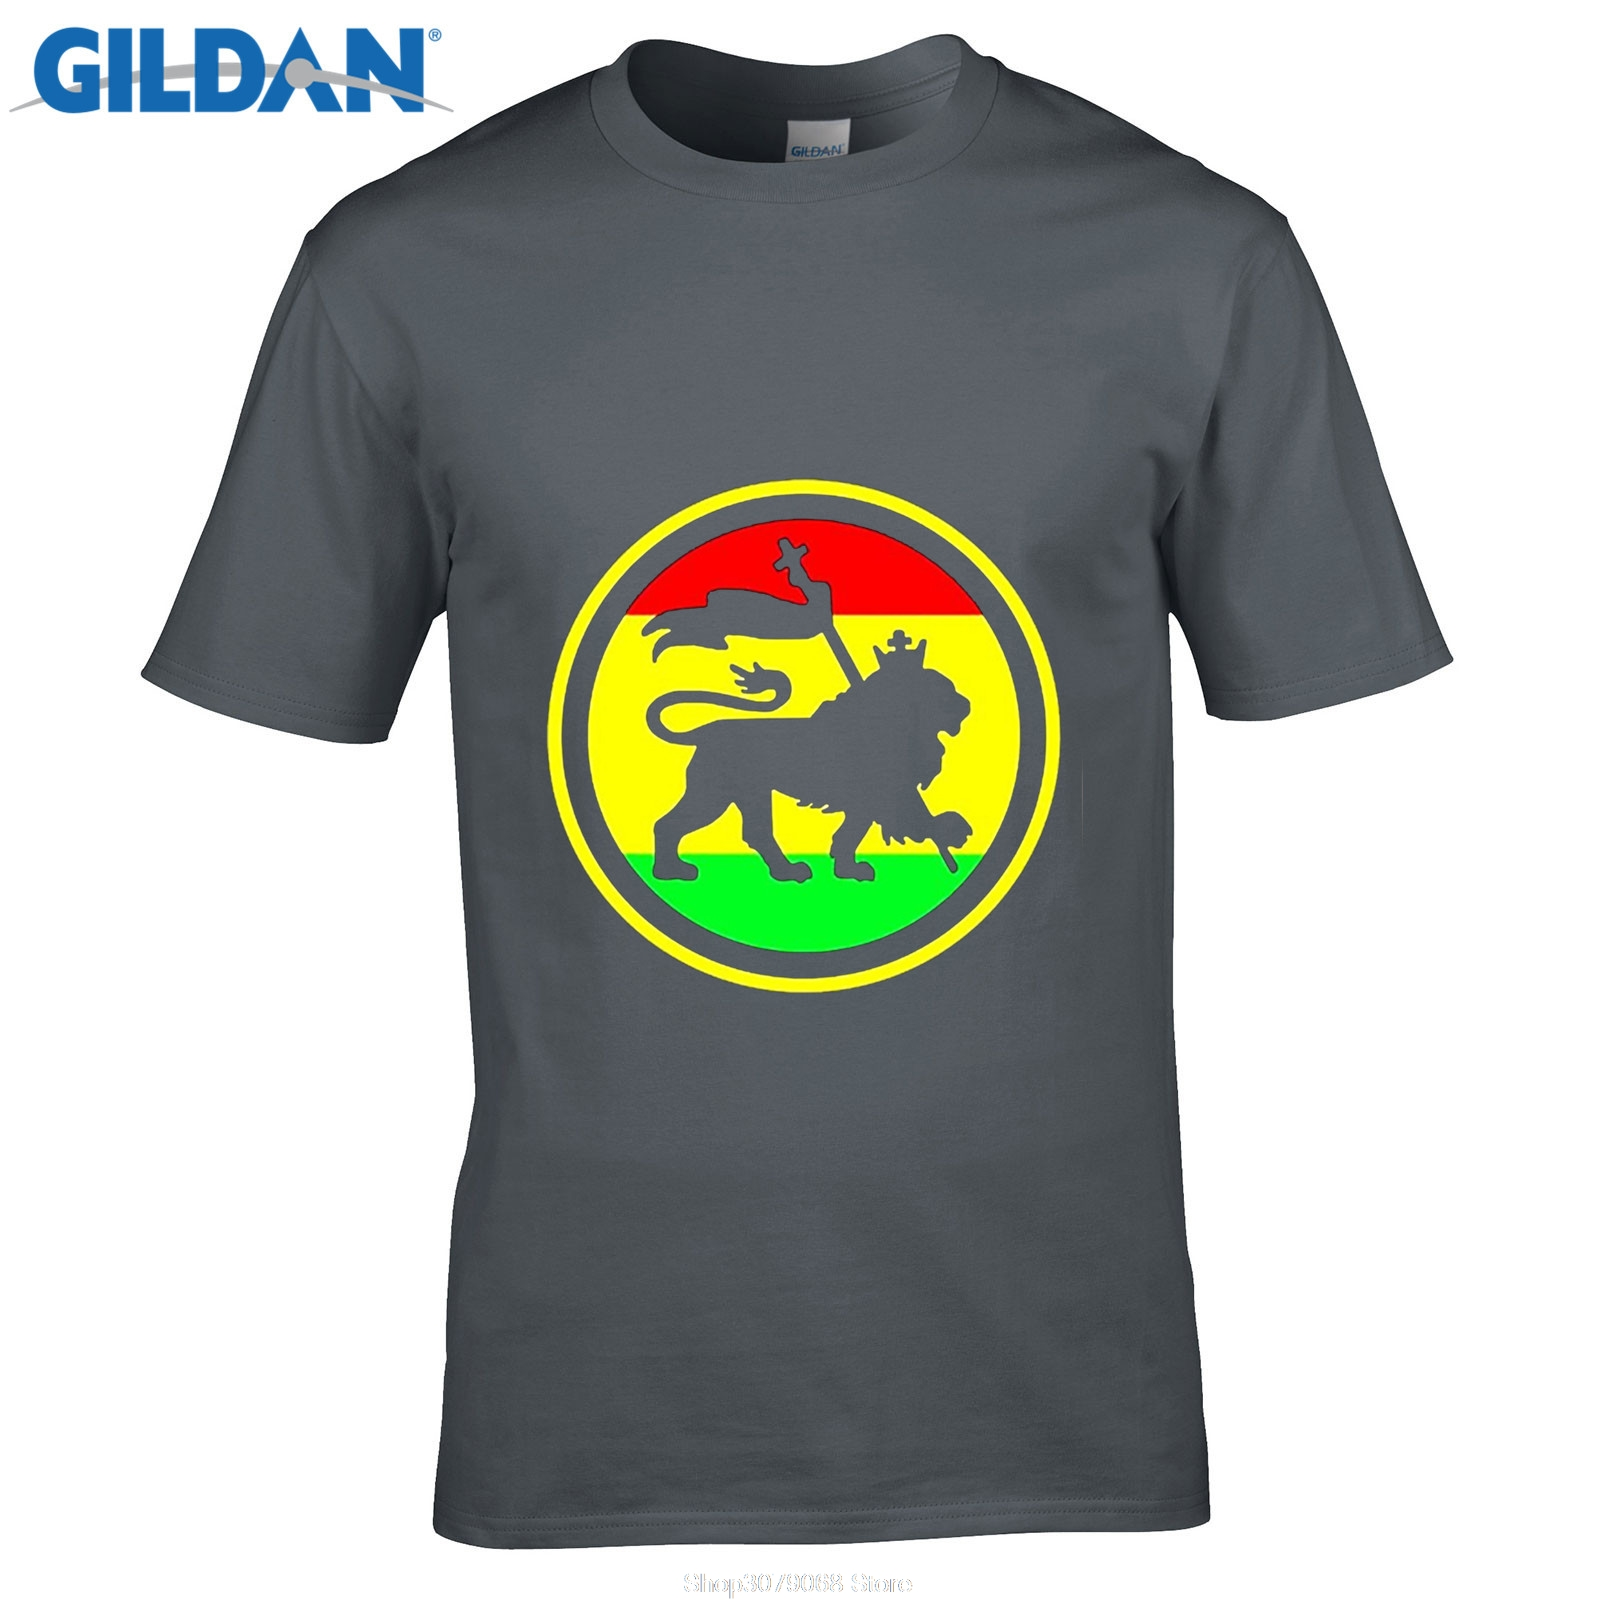 Gildan Designer T Shirtlowest Price Printe Design Graphic T Shirts